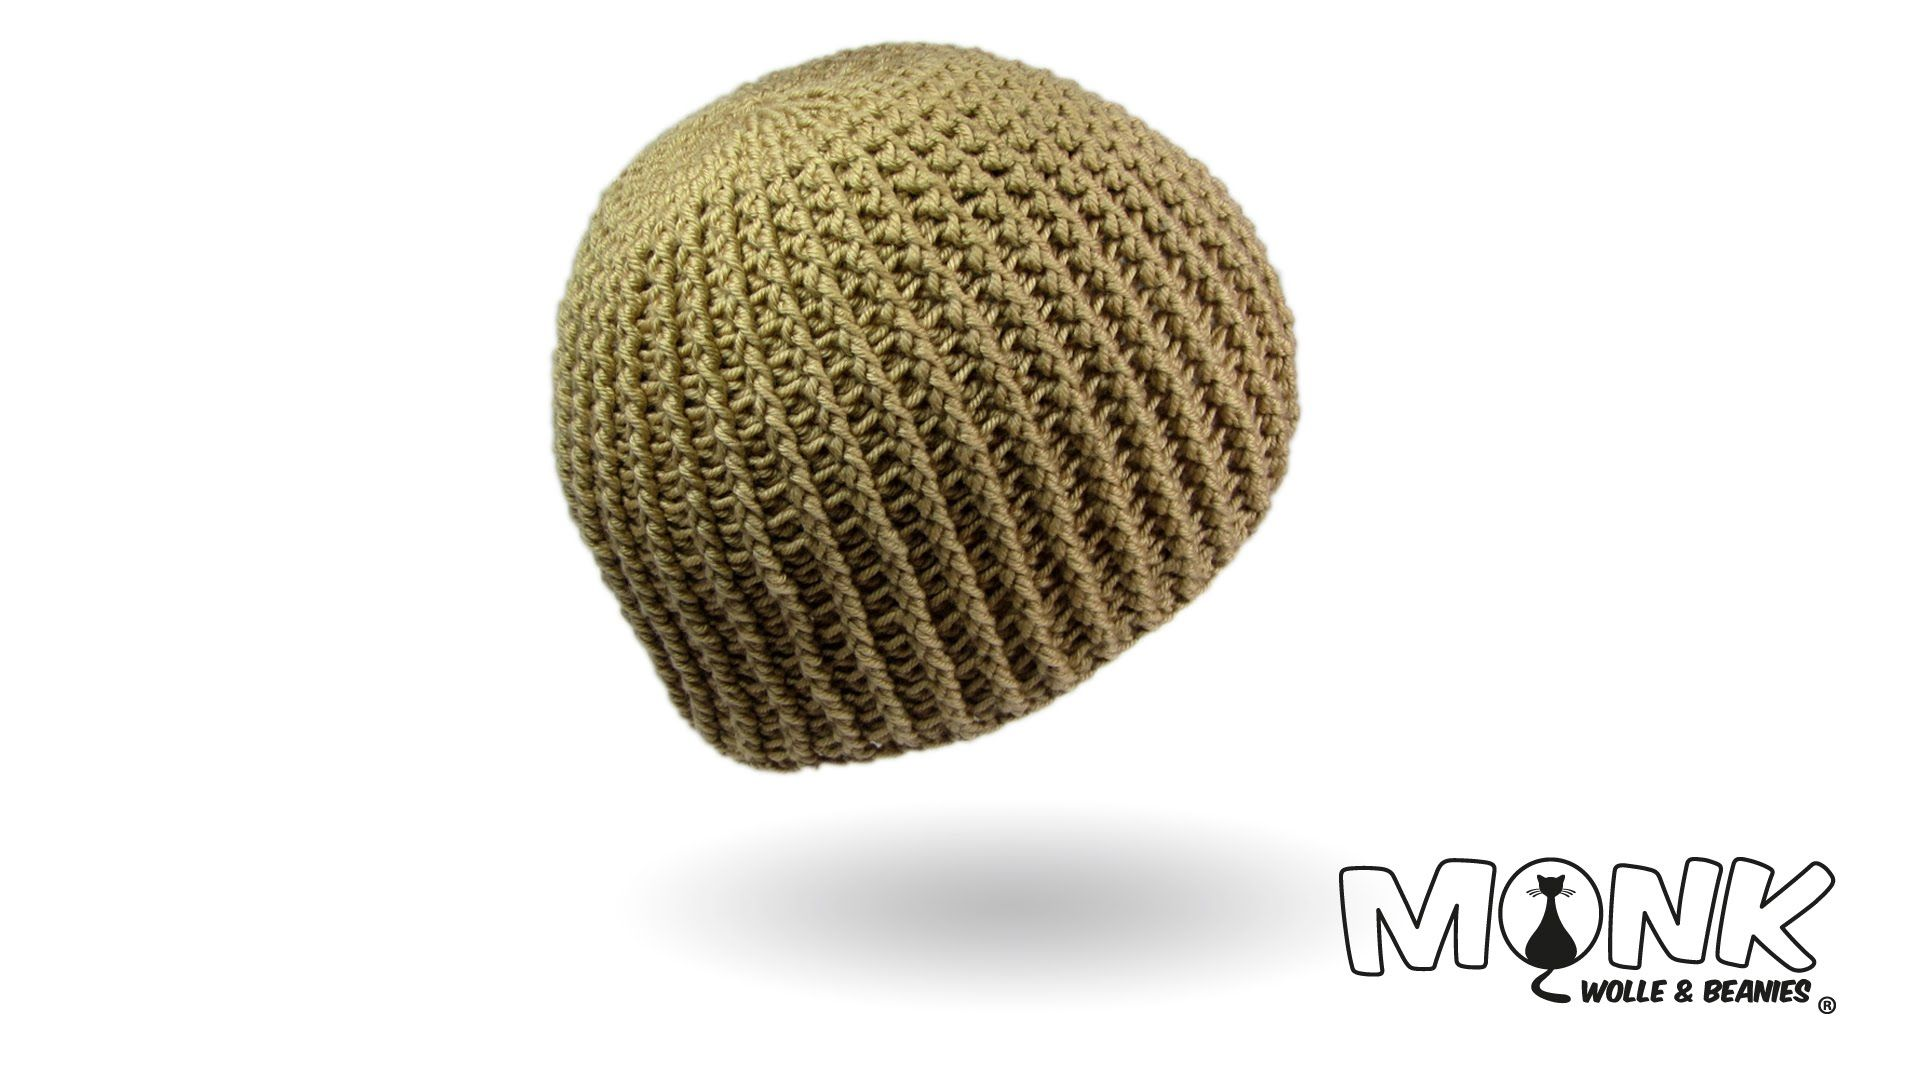 Mütze häkeln im Rippenmuster - Ribbed Beanie häkeln | Crochet Skirts ...